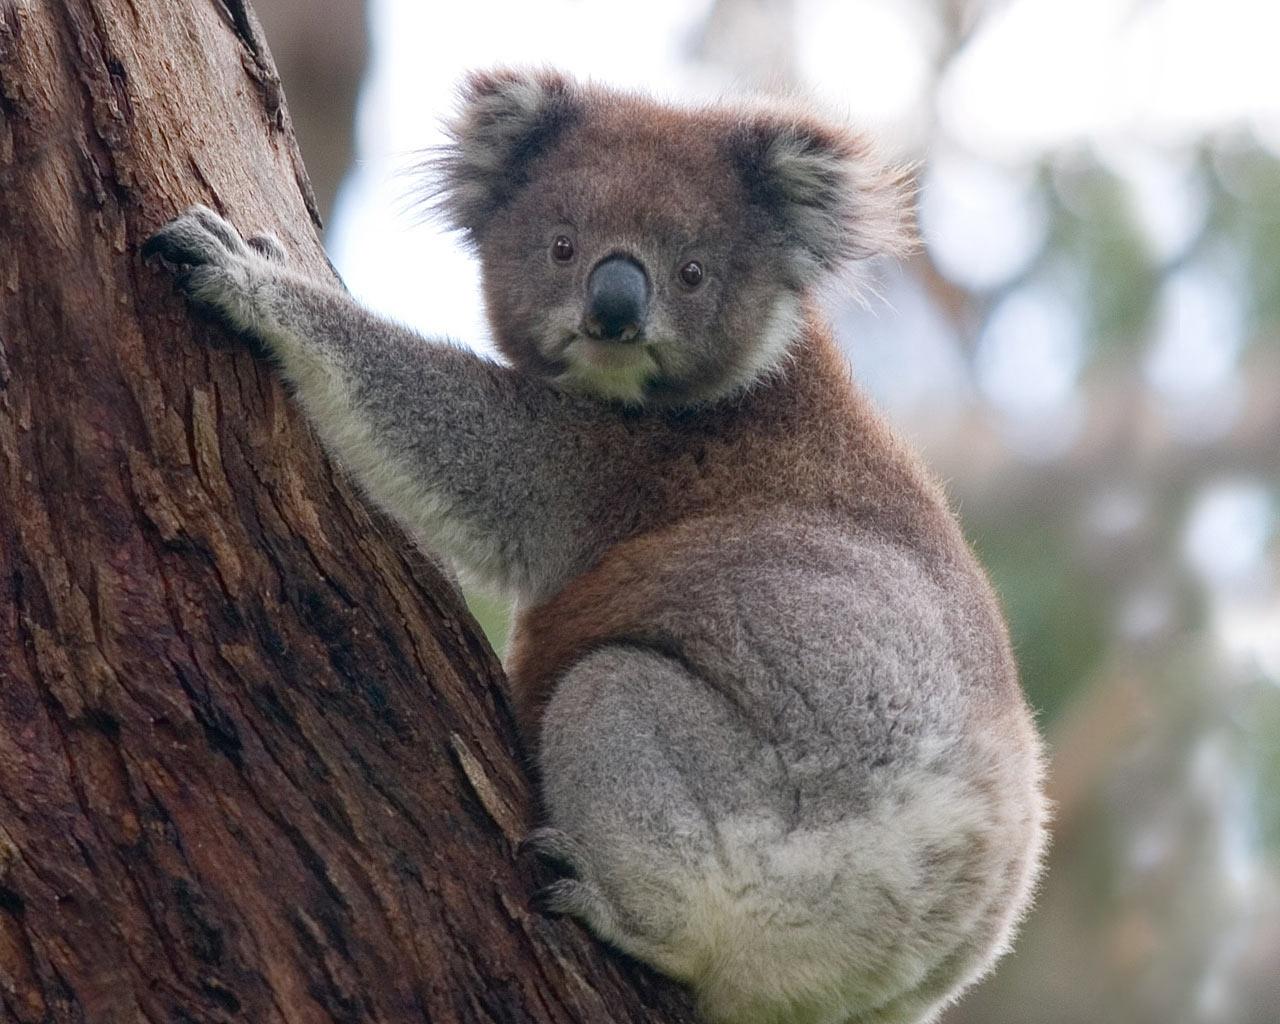 Koala tail - photo#24